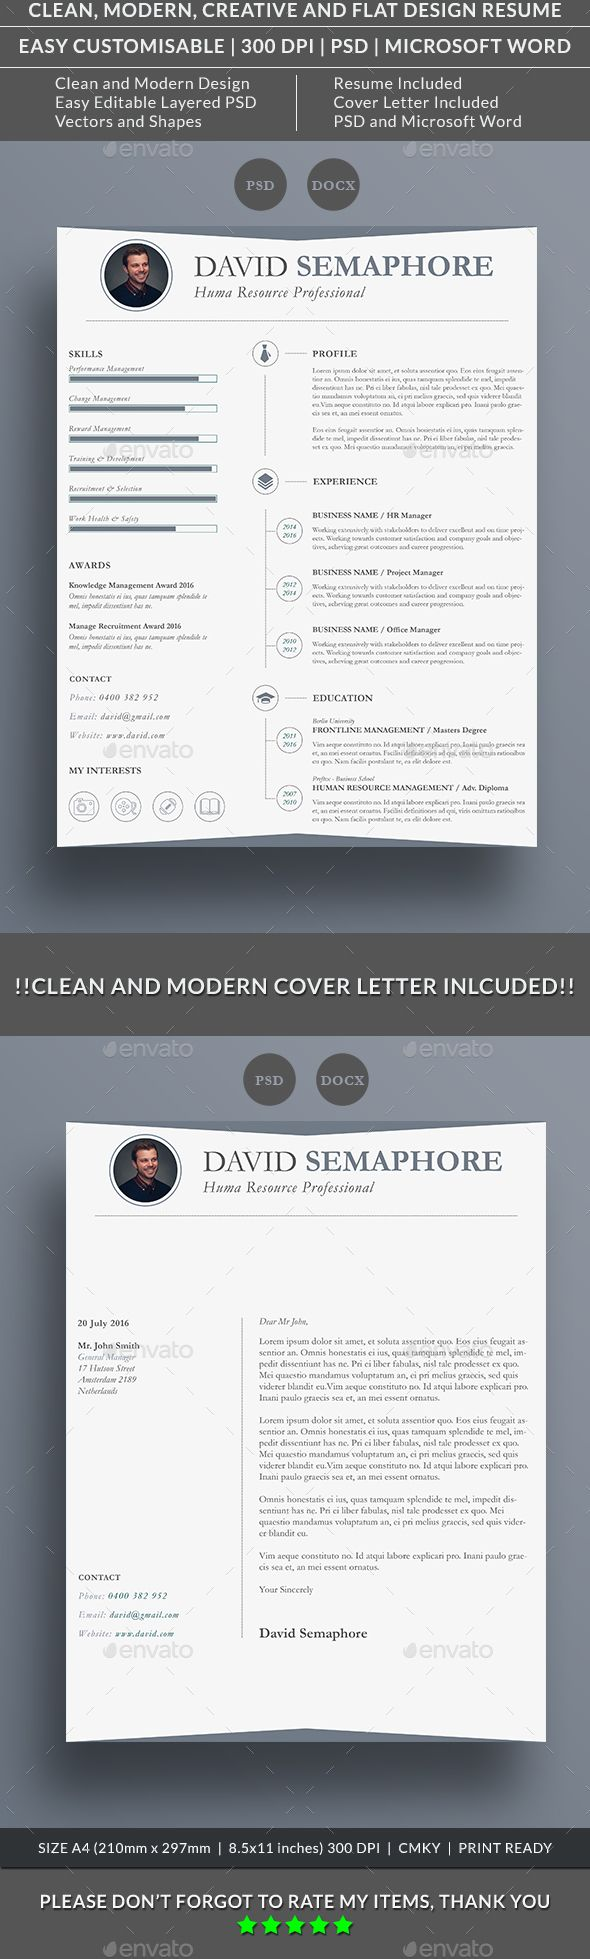 Creative Resume Set 03 Creative Resume Templates Design Resume